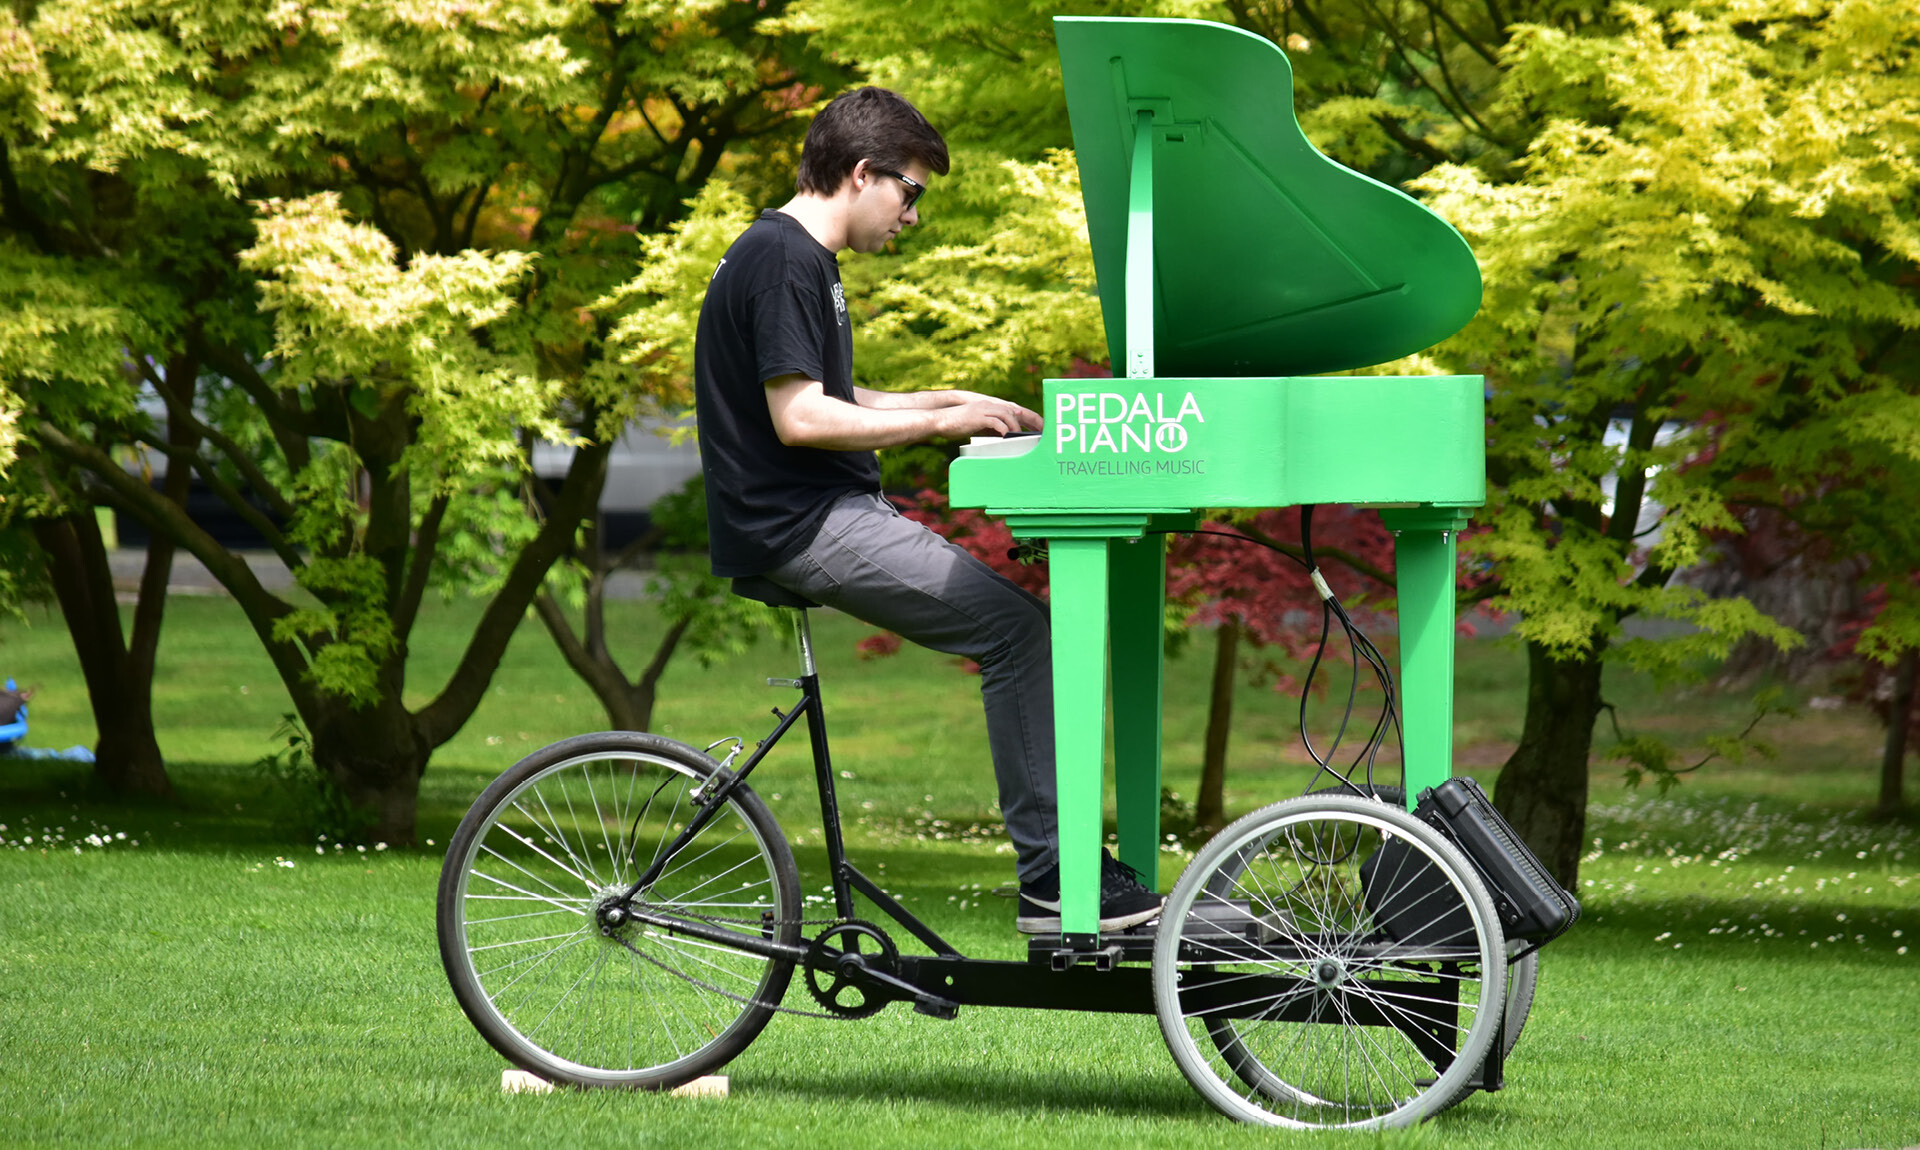 Verdi Off:   PEDALA PIANO